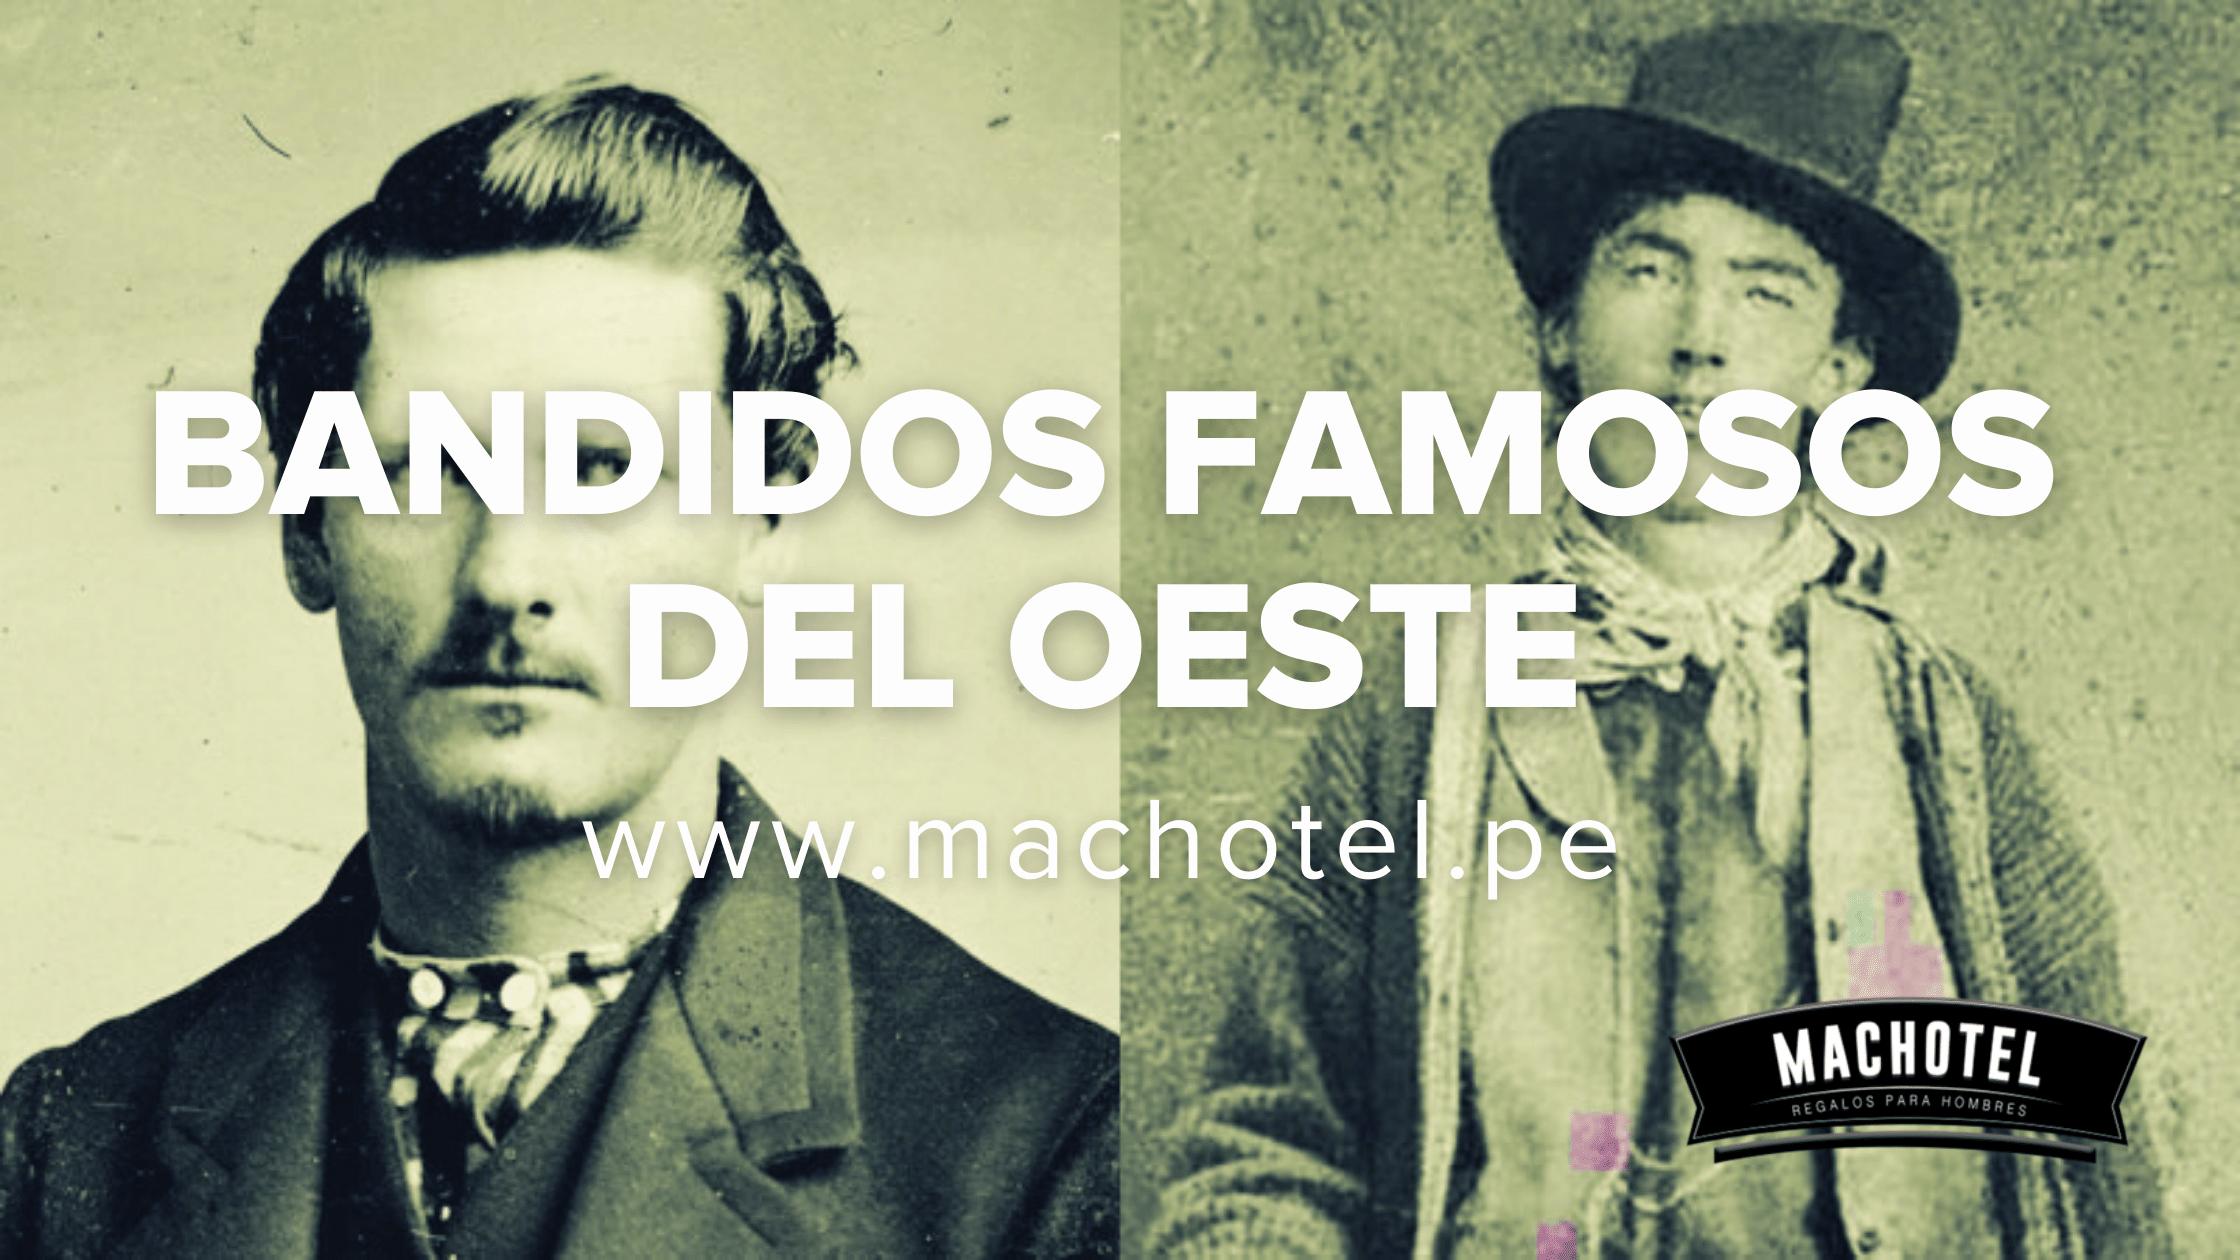 Bandidos famosos del Lejano Oeste